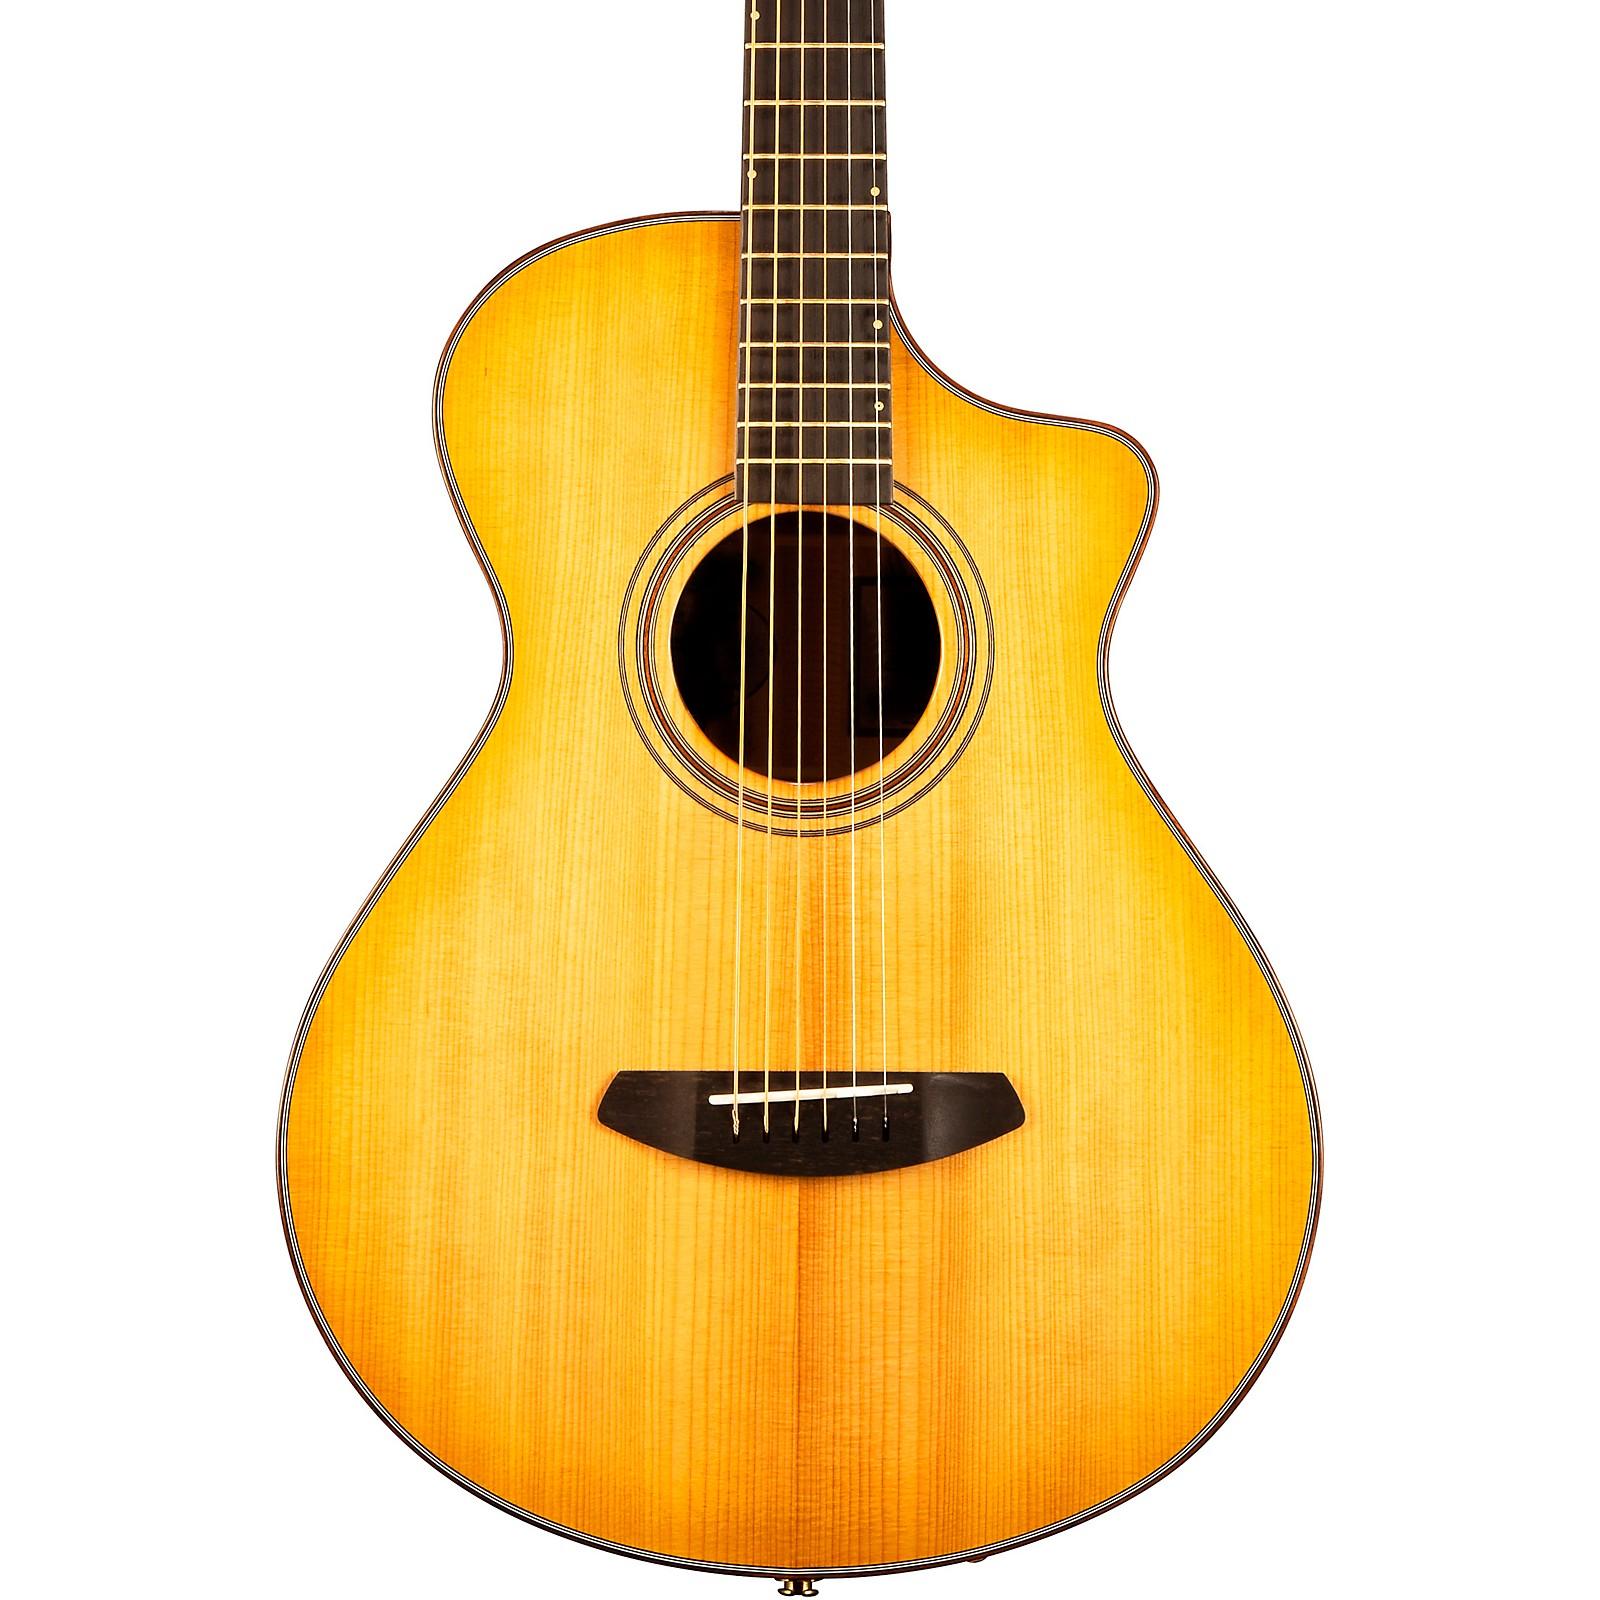 Breedlove Organic Collection Artista Concertina Cutaway CE Acoustic-Electric Guitar